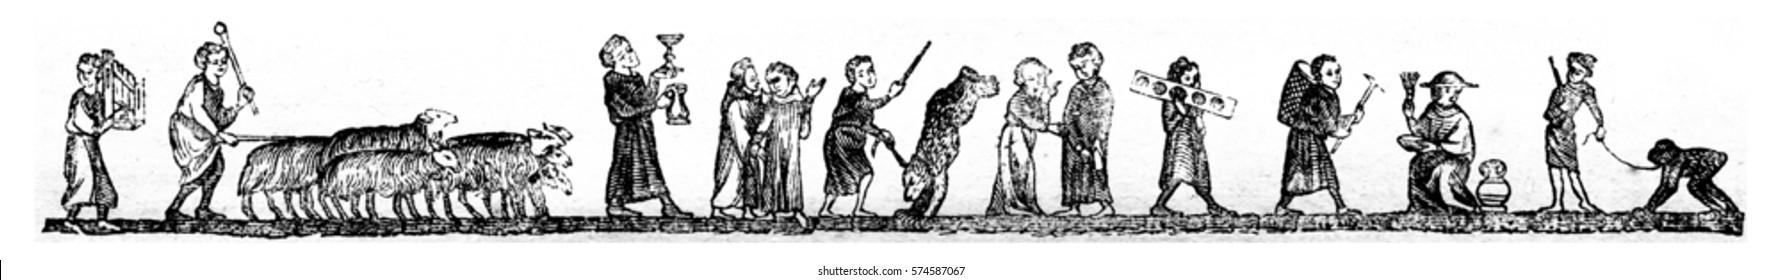 Menetrier, Shepherd, Shouter of wine, Juggler, Merchant ambulant forget, Chiffonier, Dairy, Monkey showman, vintage engraved illustration. Magasin Pittoresque 1846.